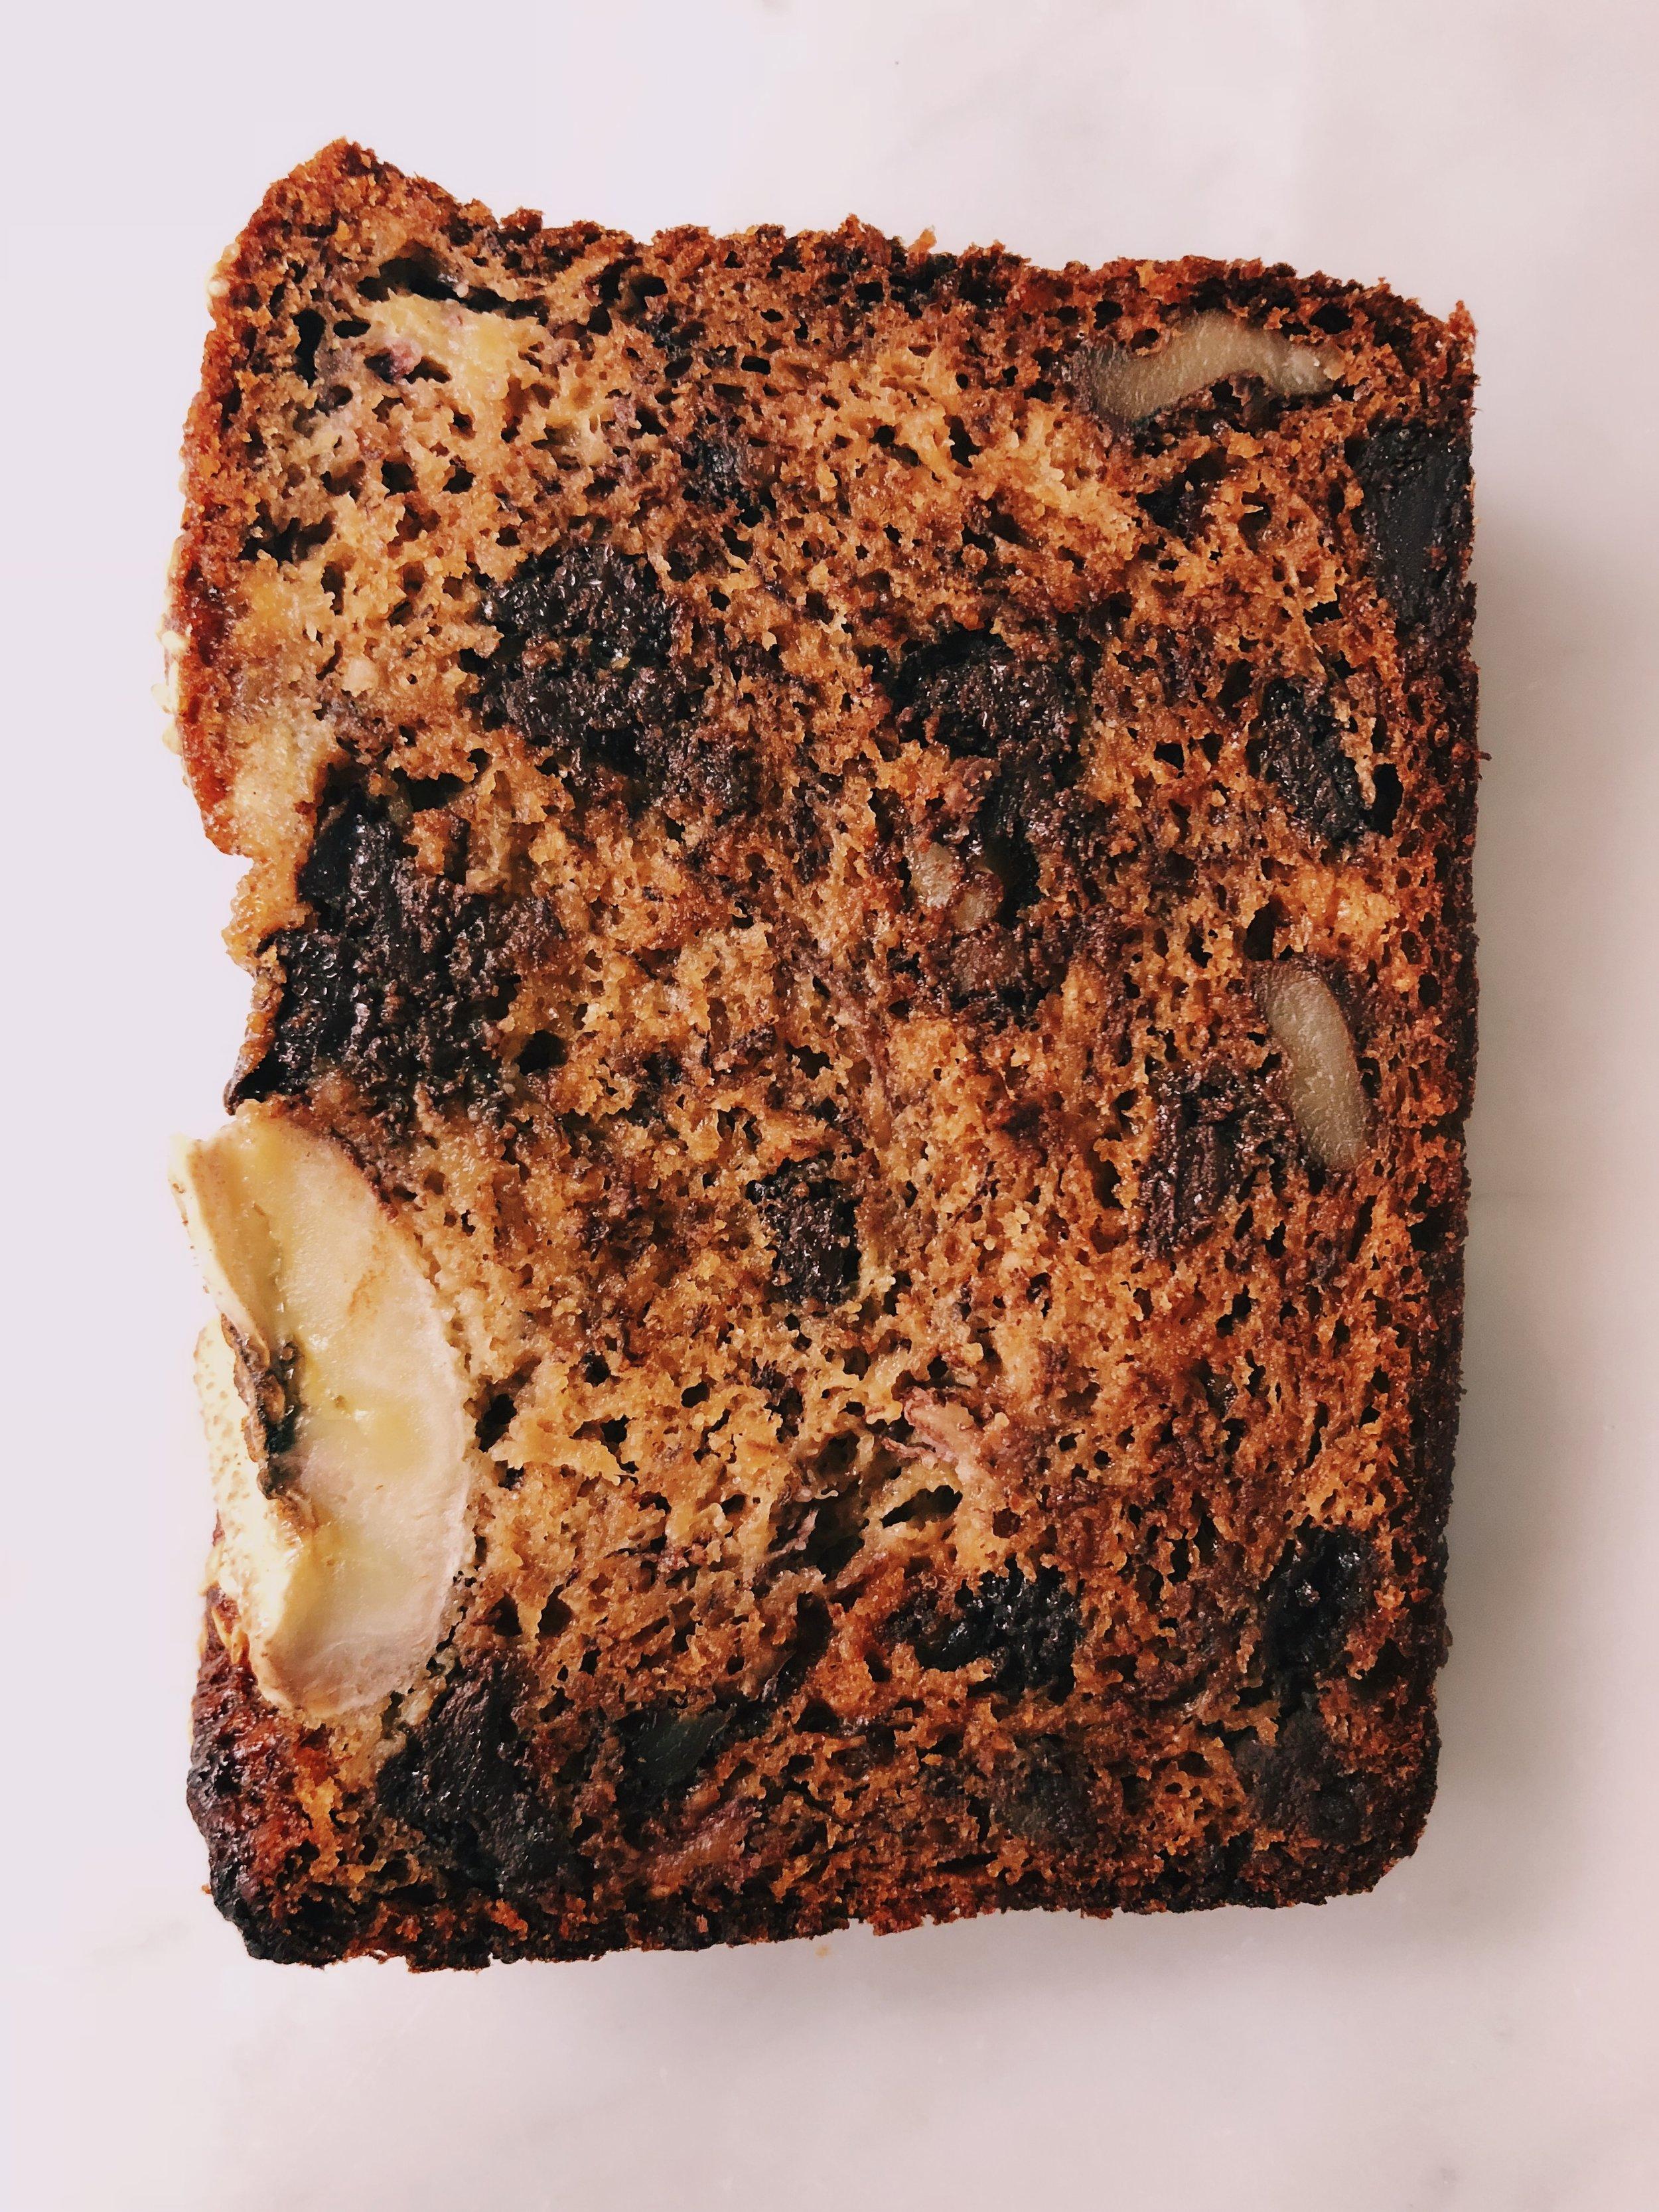 slice of chocolate chip pecan tahini banana bread by kalejunkie